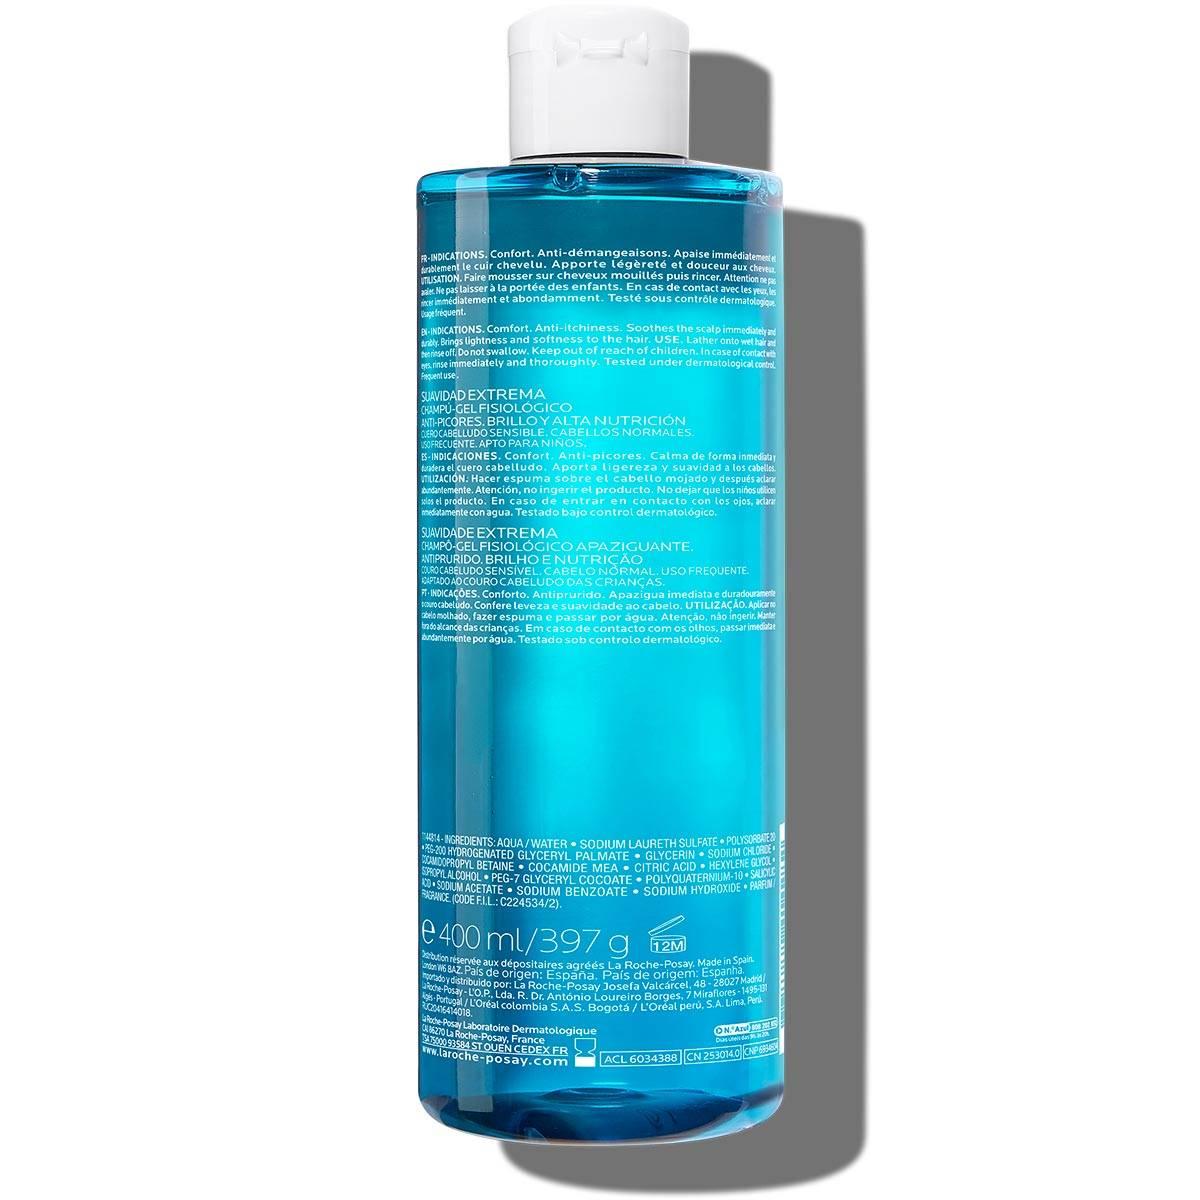 La Roche Posay Tuotesivu Kerium Extra Gentle Gel Shampoo 400ml 33378